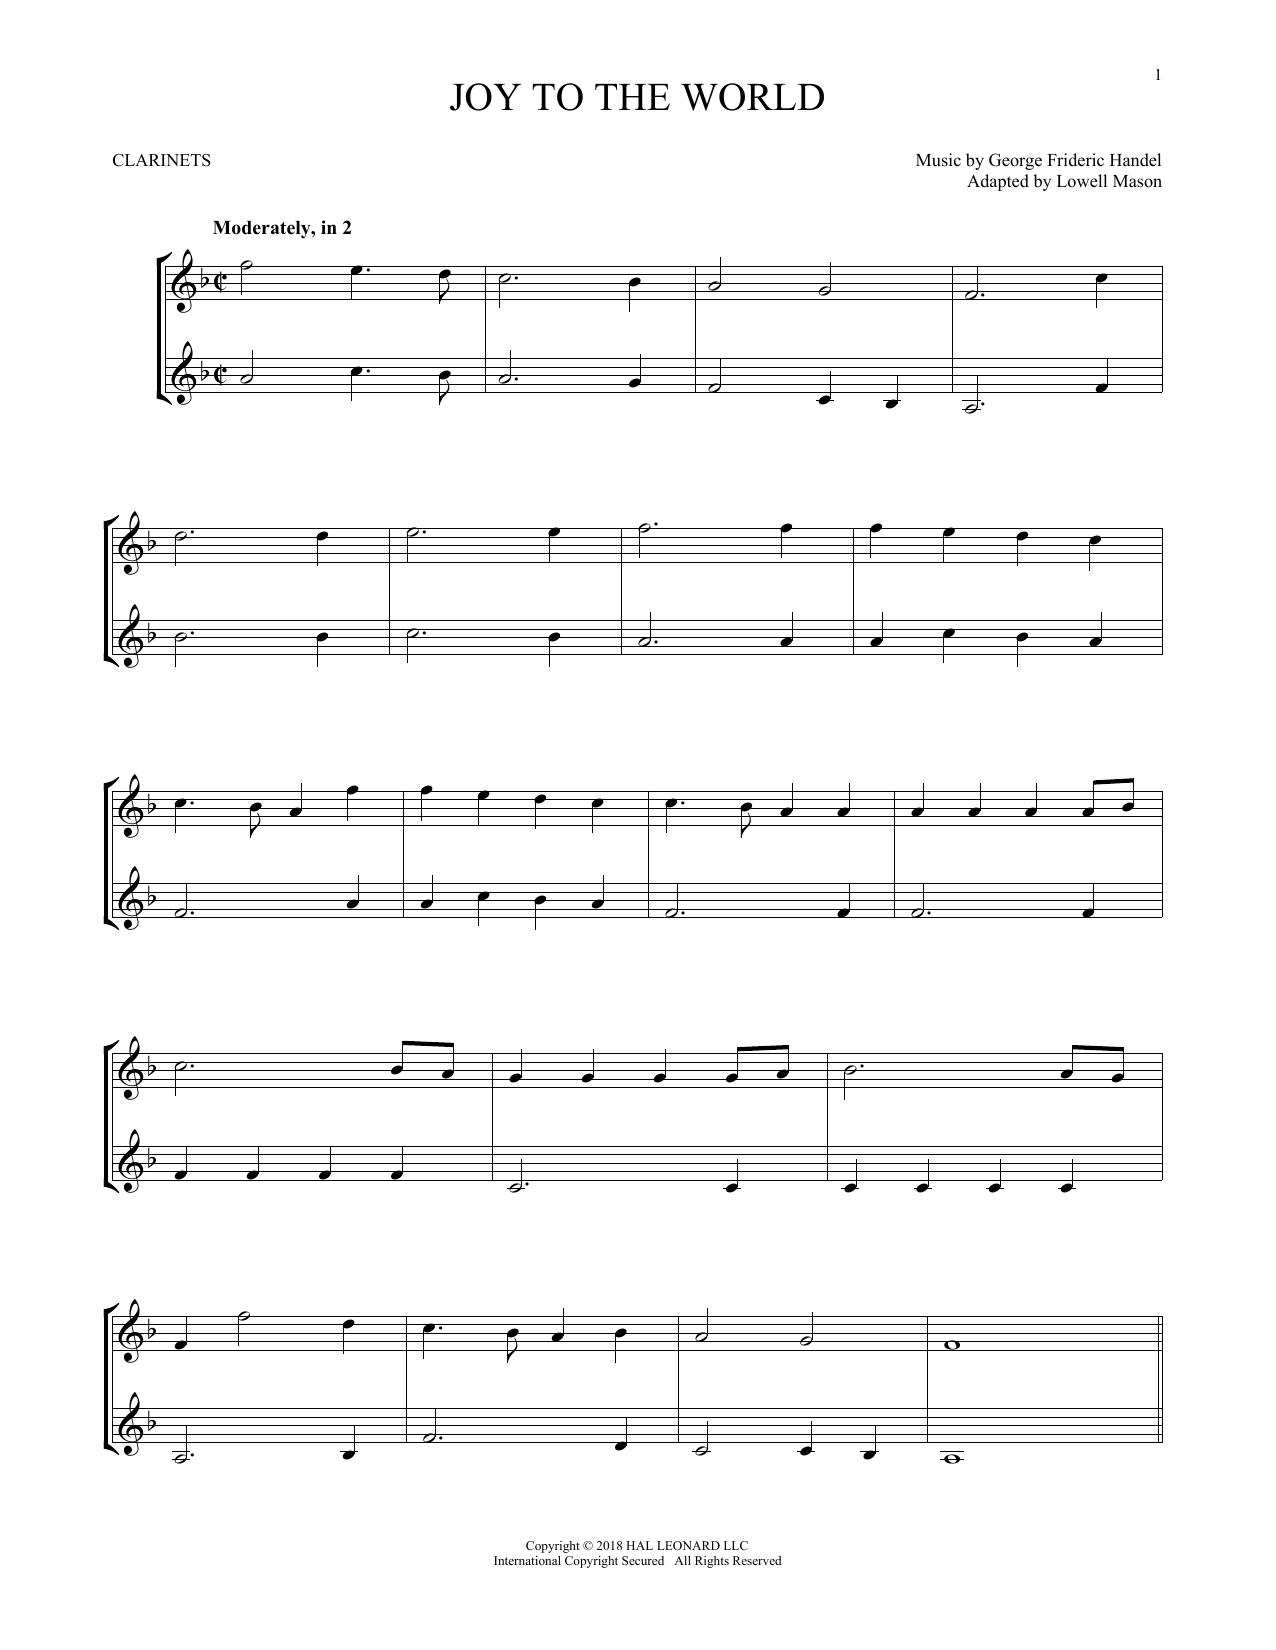 Joy To The World (Clarinet Duet)